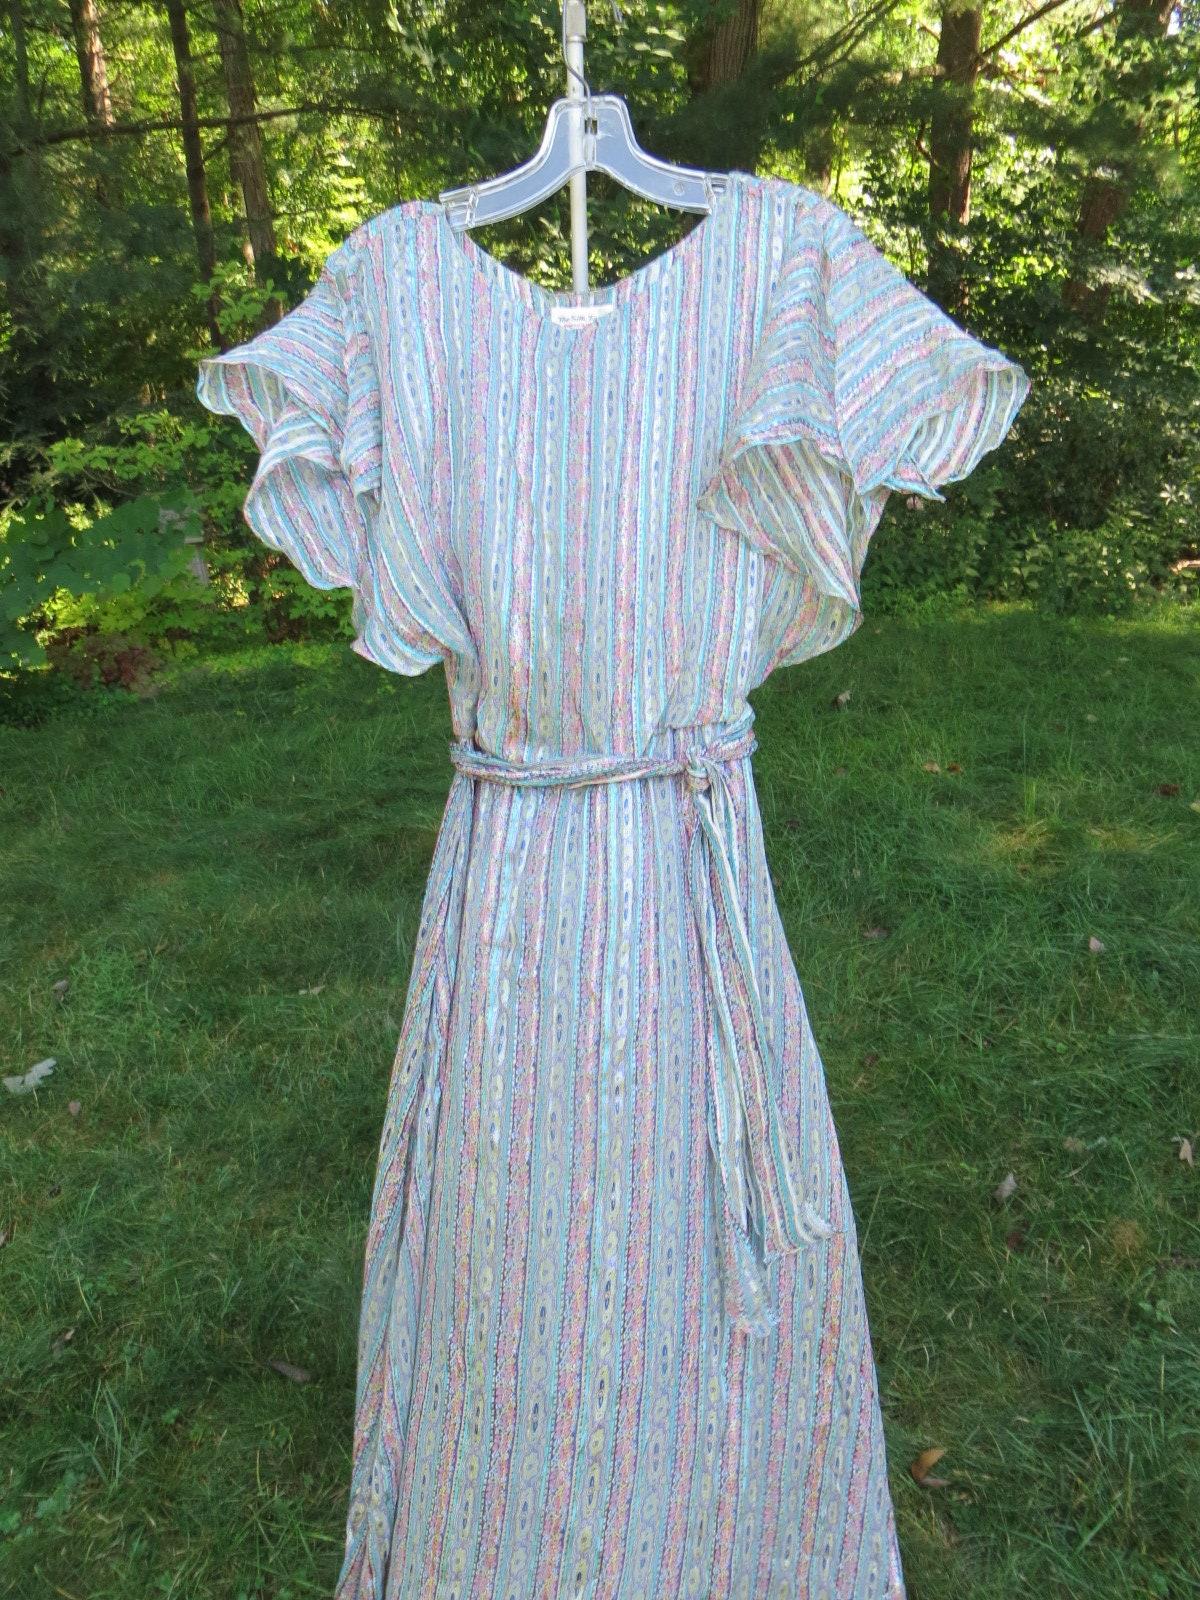 Vintage Scarf Styles -1920s to 1960s Vintage Feminine Silk Dress Incinco The Farm 70s Sheer  Pretty Pale Colors Print Midi Flowy Seventies $0.00 AT vintagedancer.com